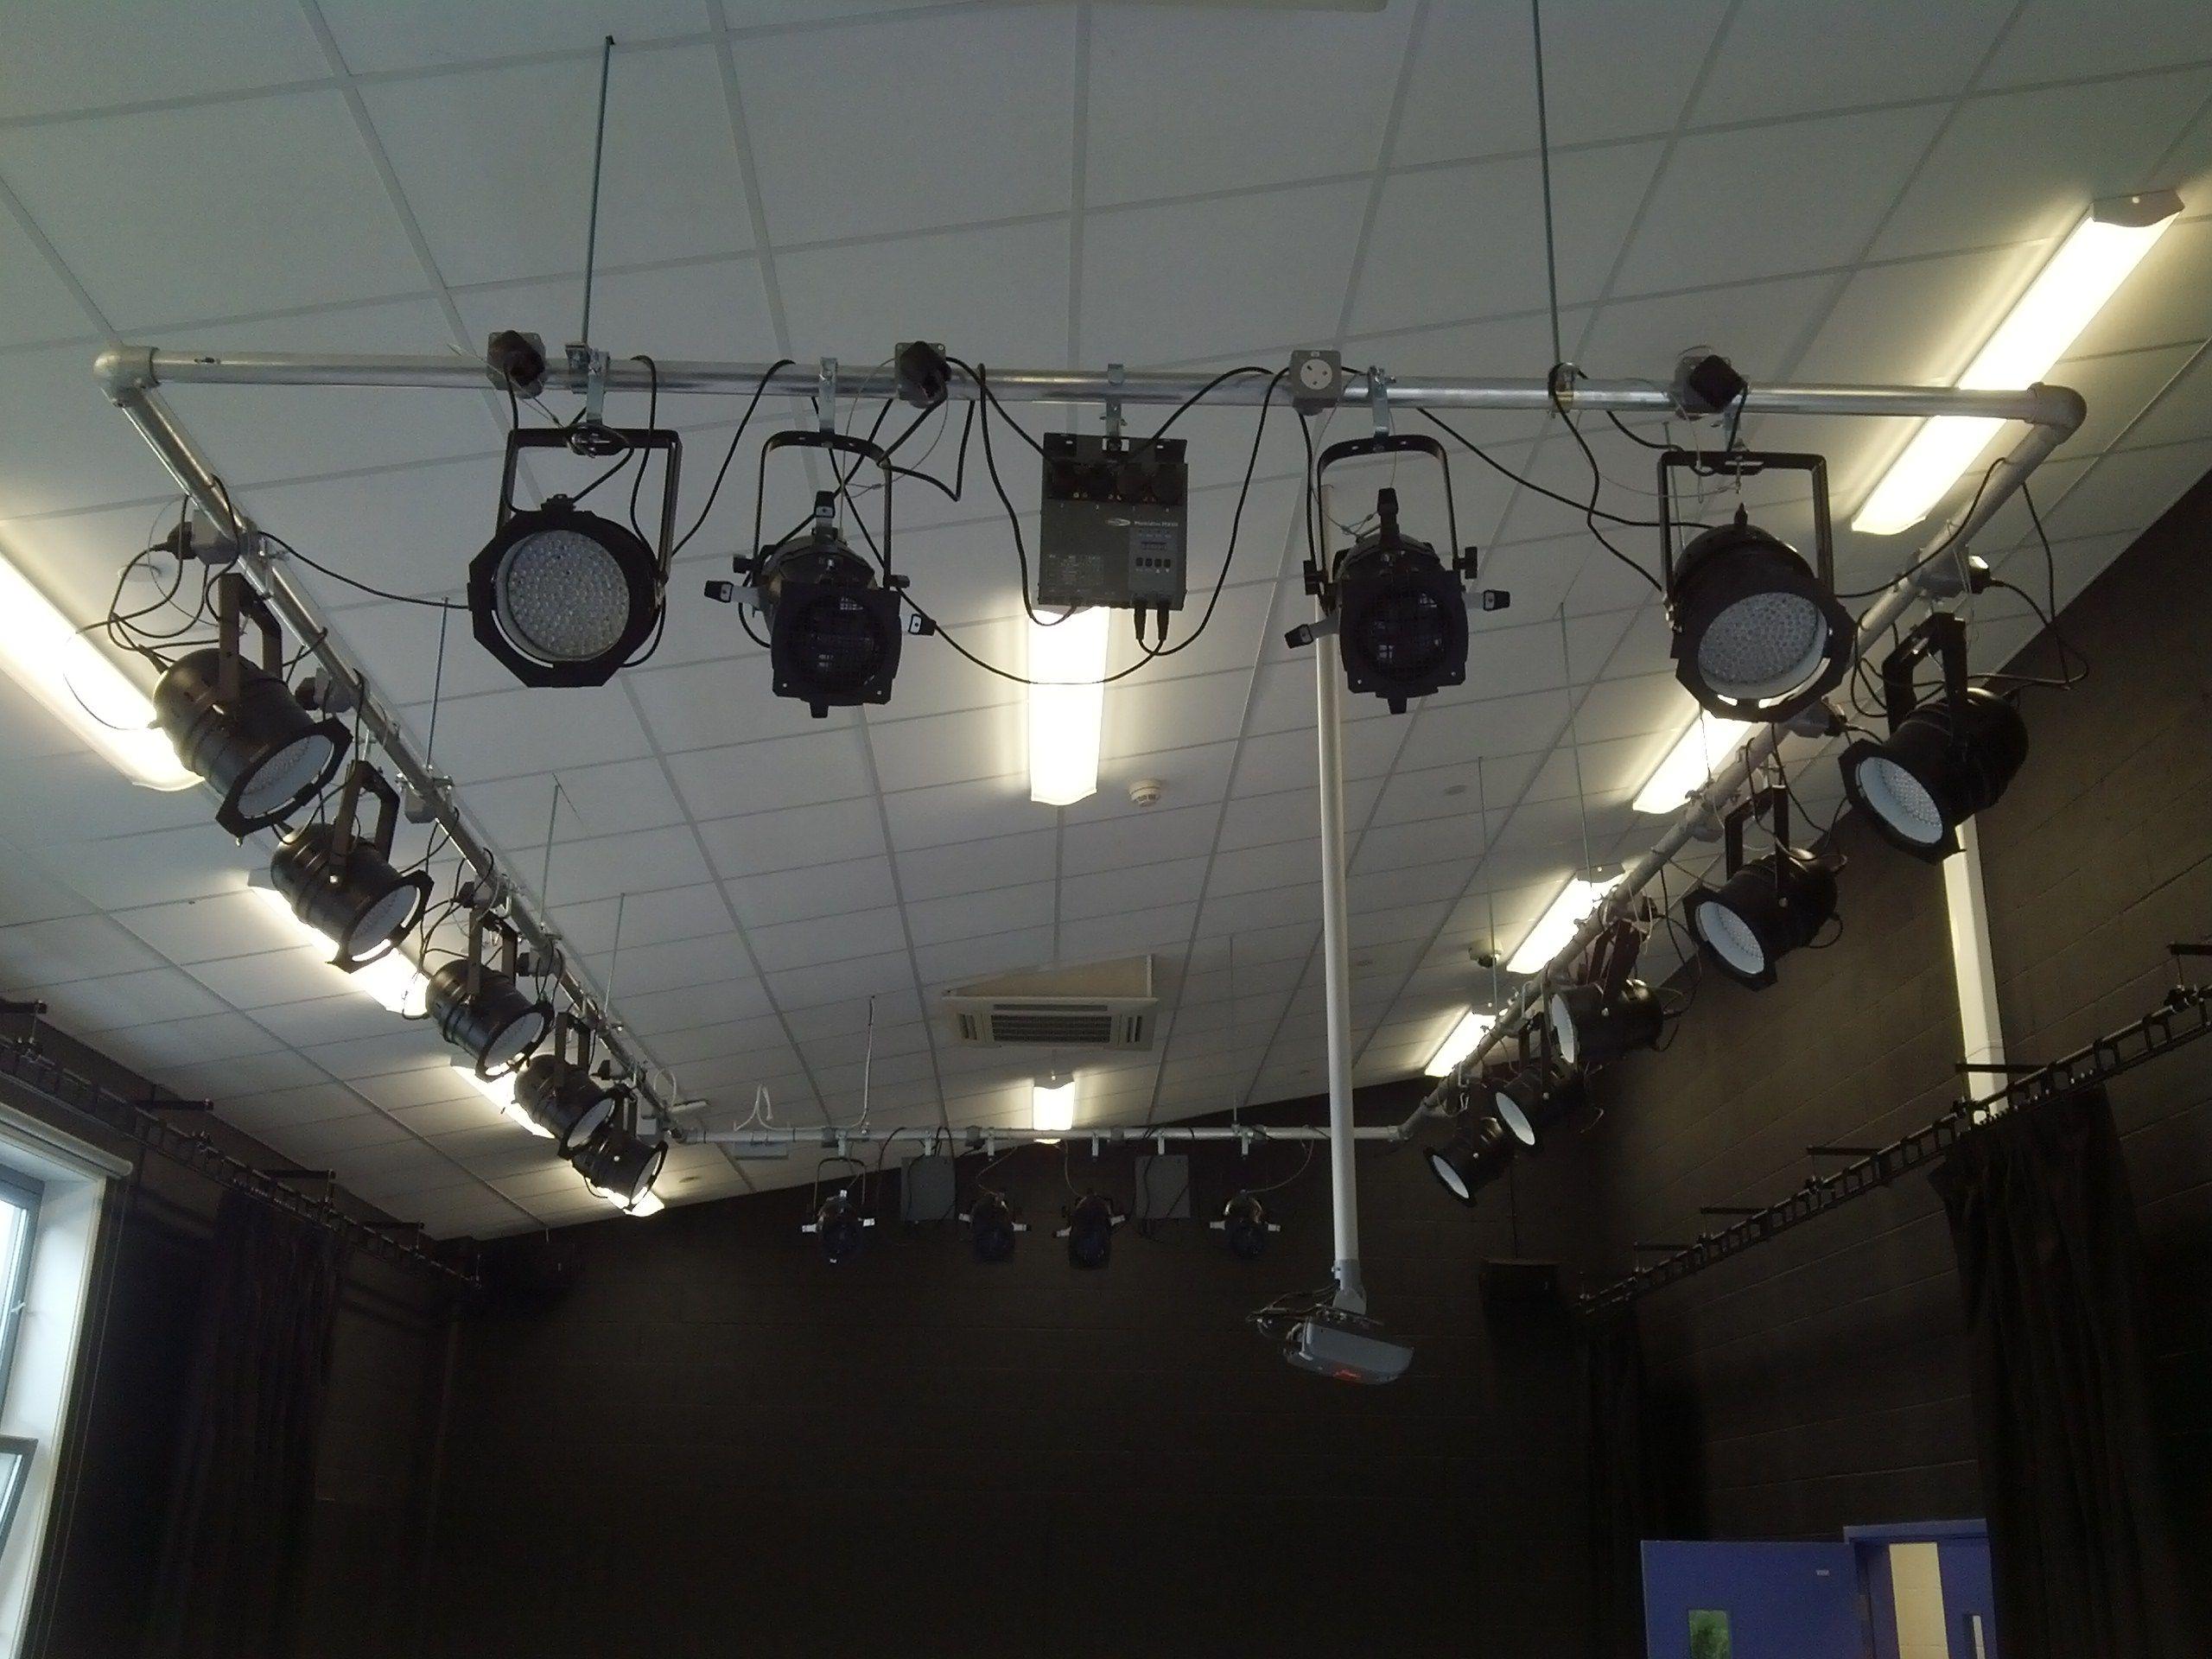 drama studio lighting - Google Search & drama studio lighting - Google Search | Art Studio | Pinterest ... azcodes.com